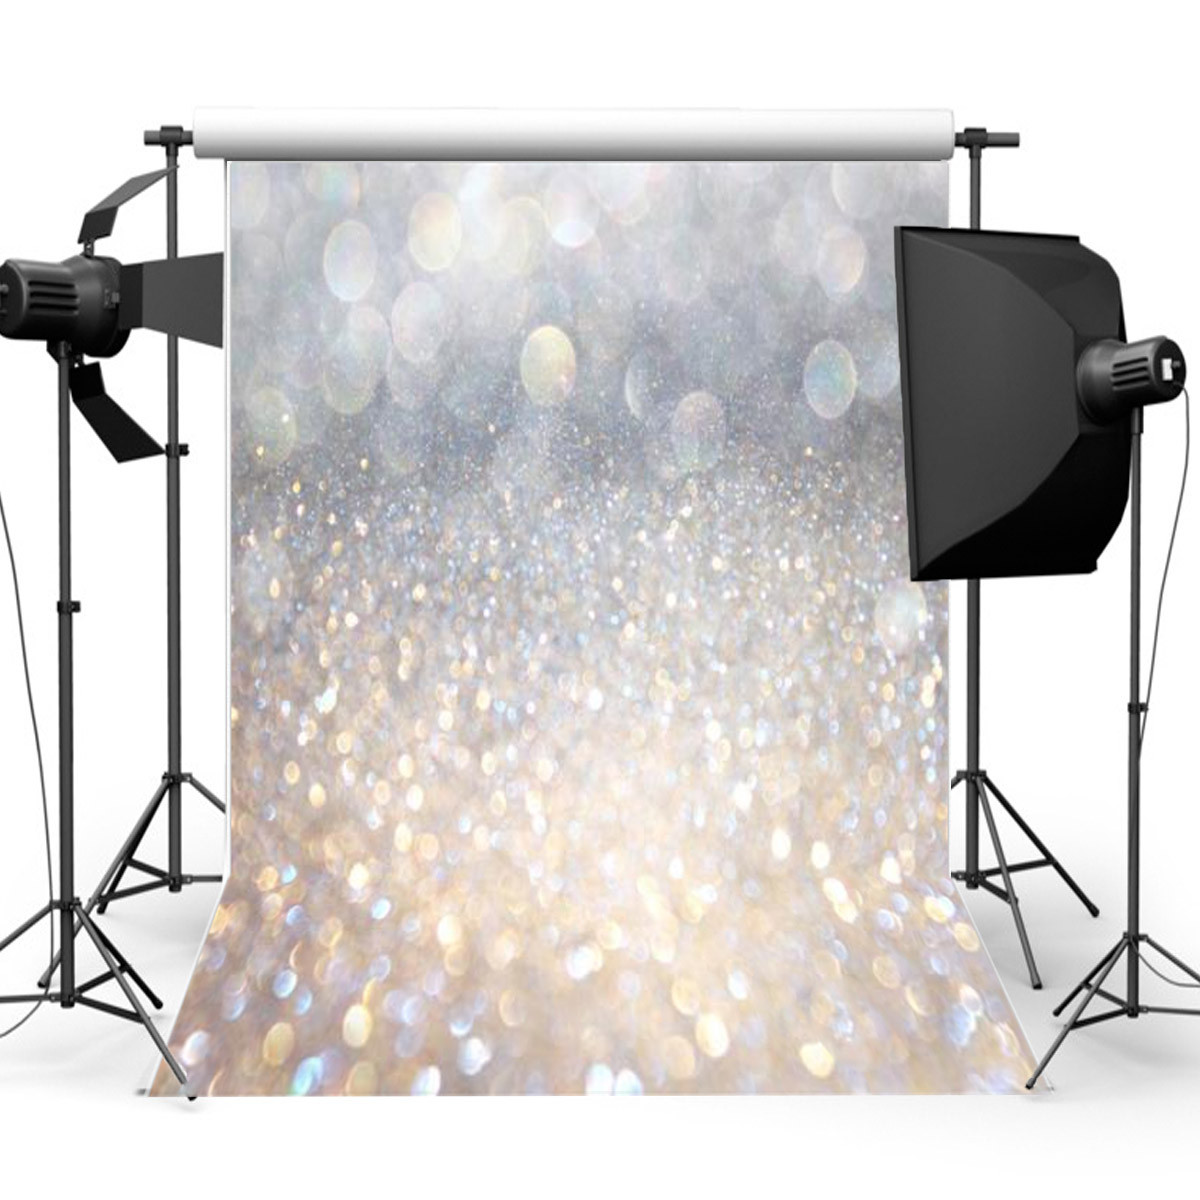 5x7ft Christmas Photography Vinyl Fabric Backdrop Background Photo